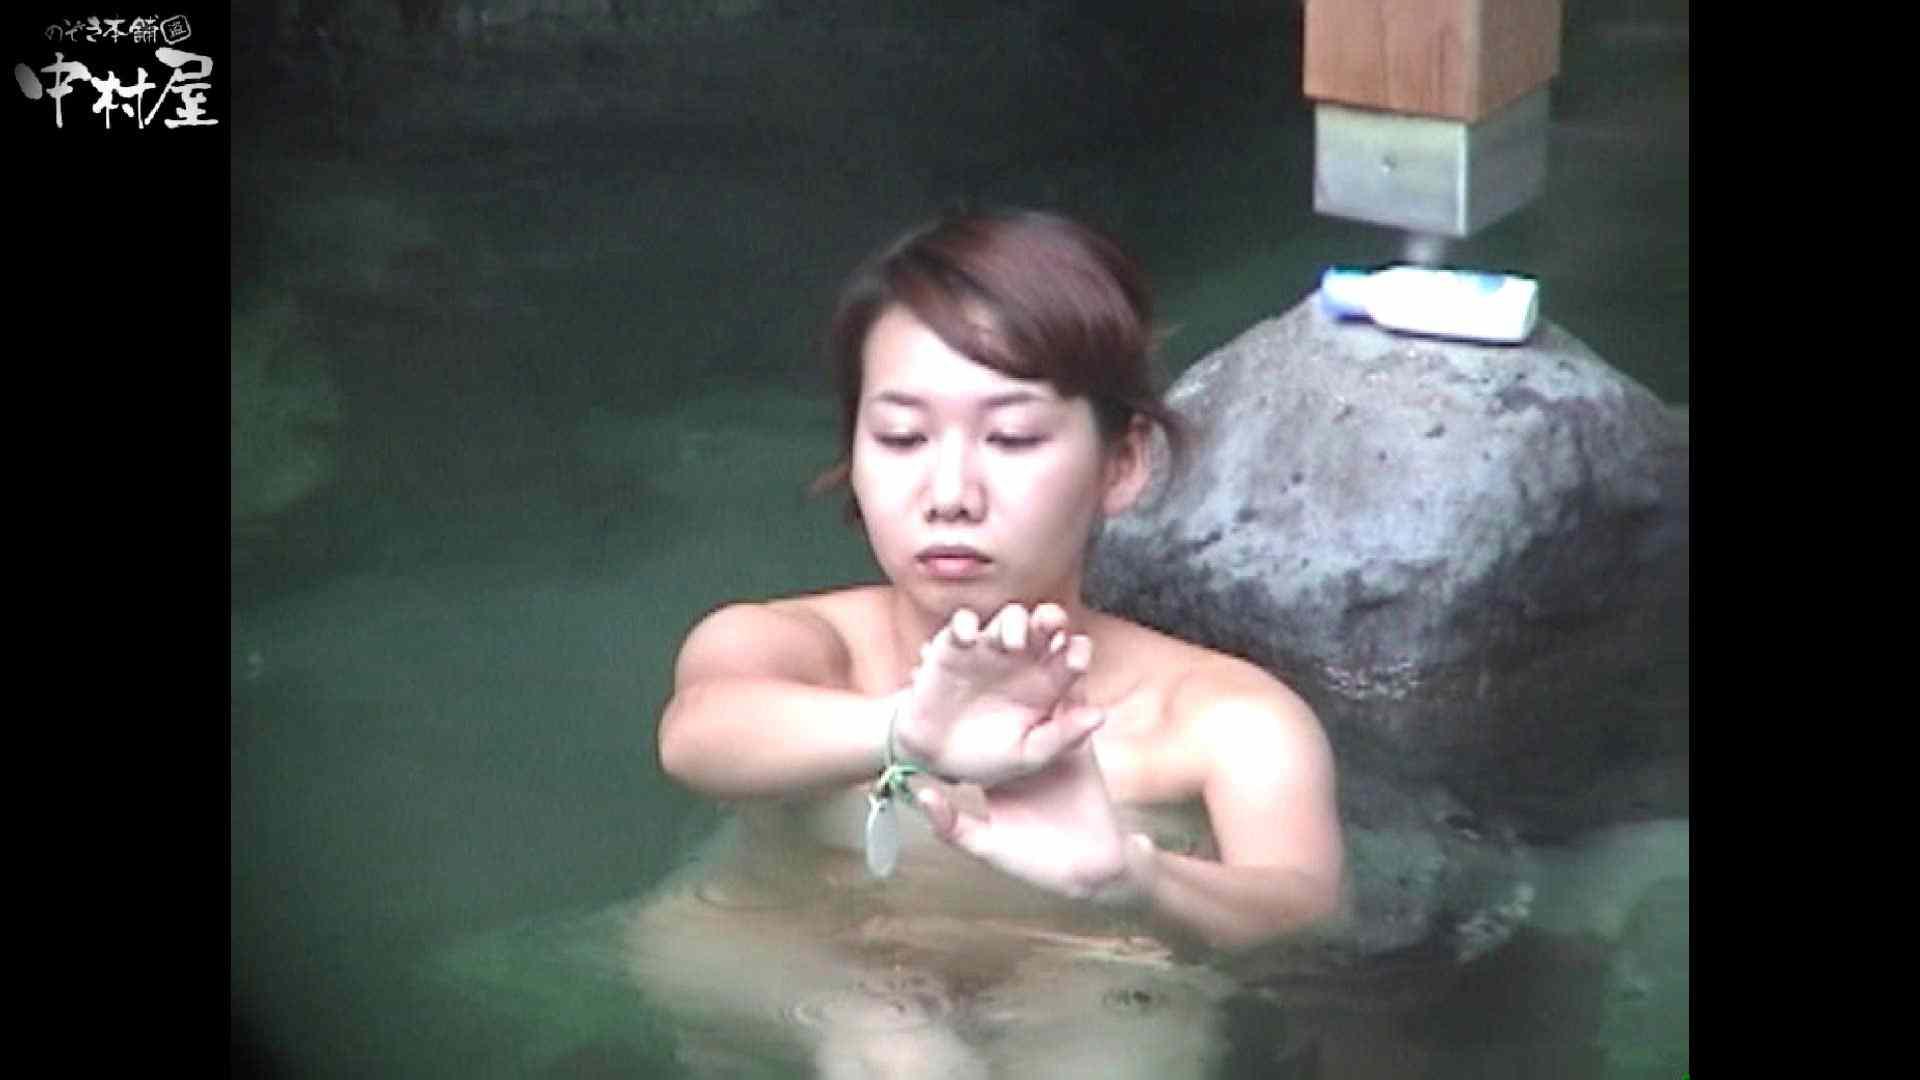 Aquaな露天風呂Vol.951 盗撮師作品  96pic 30